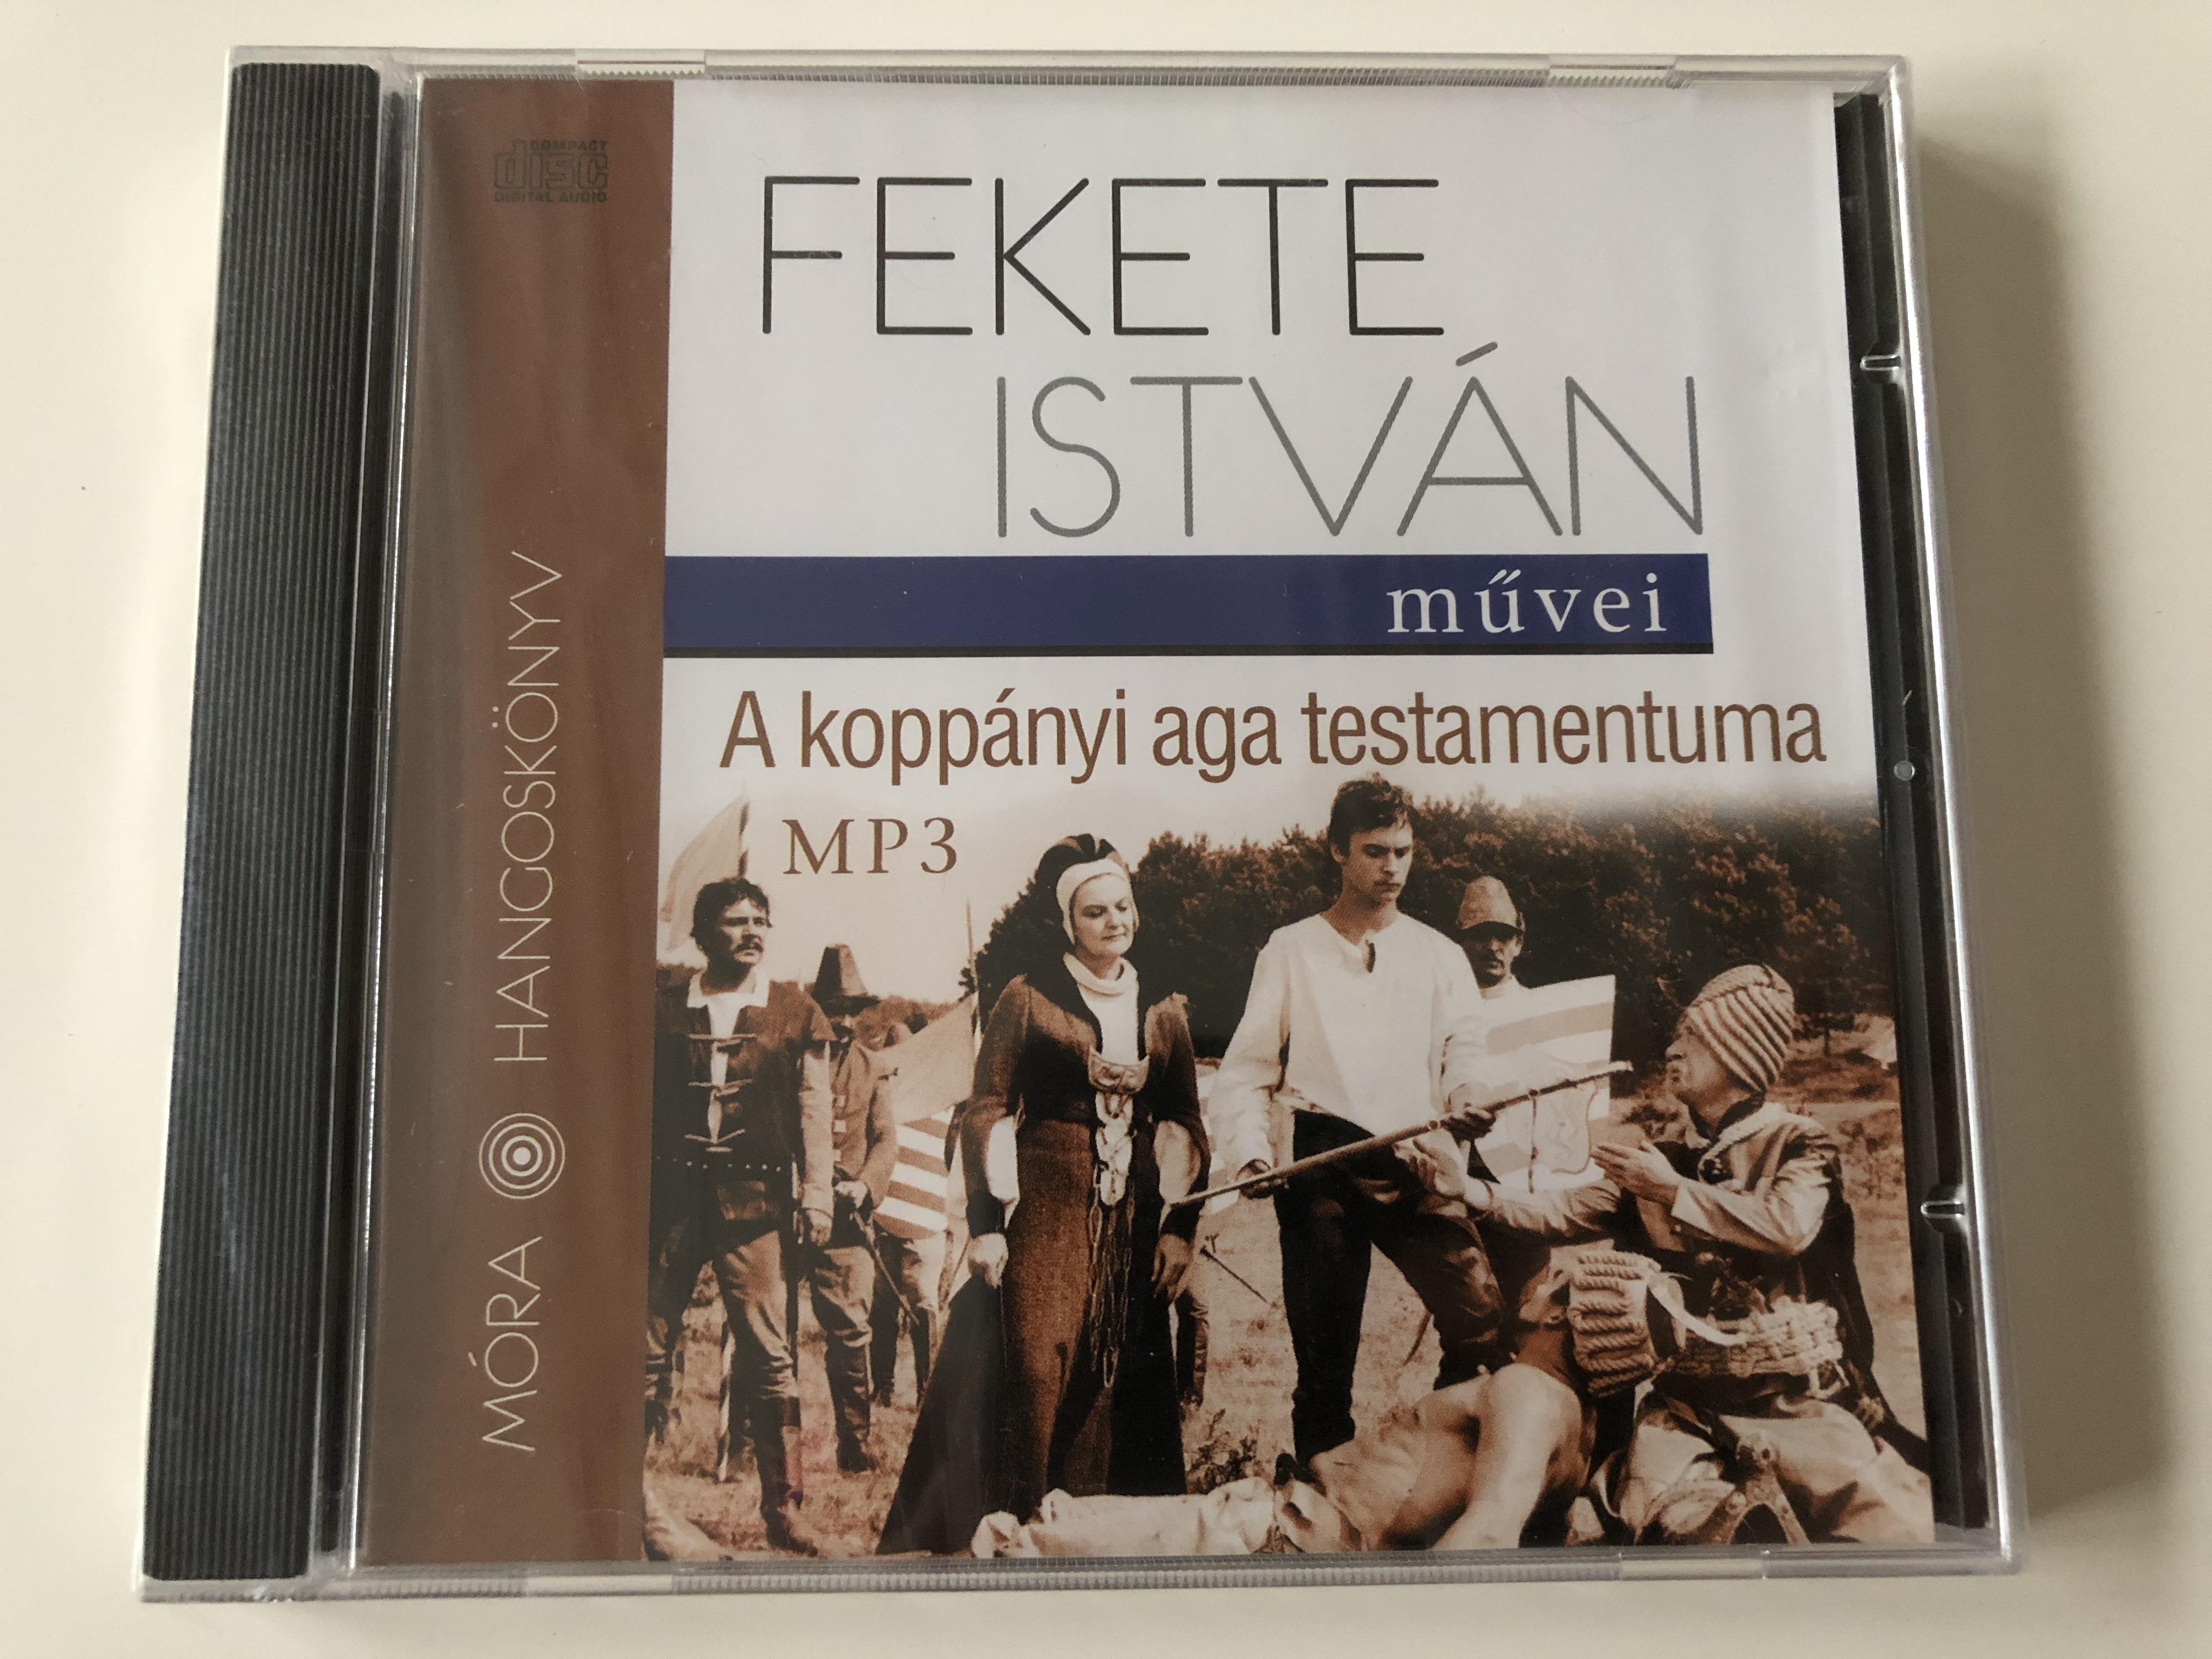 -a-kopp-nyi-aga-testamentuma-by-fekete-istv-n-hungarian-mp3-audio-book-read-by-benk-p-ter-m-ra-hangosk-nyv-2009-2-.jpg